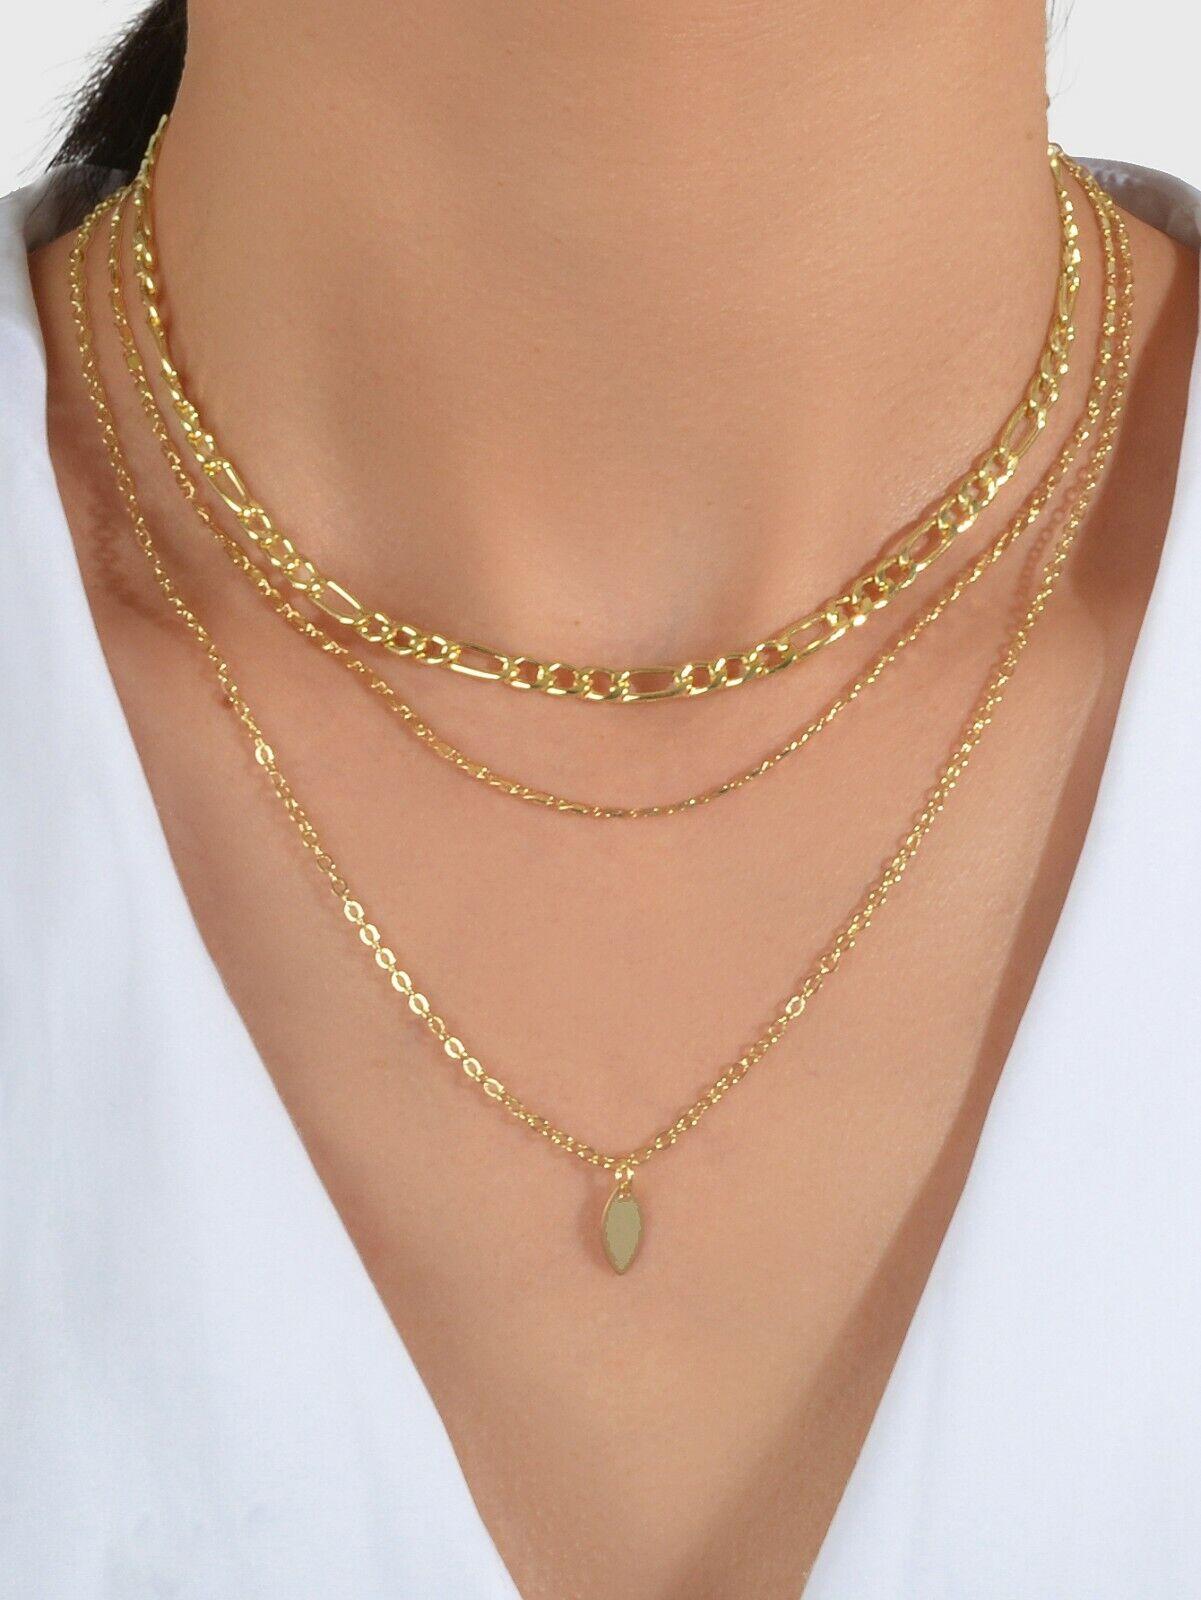 Jewellery - Women Boho Multi-Layer Choker Collar Drop Pendant Bib Necklace Jewellery Gift